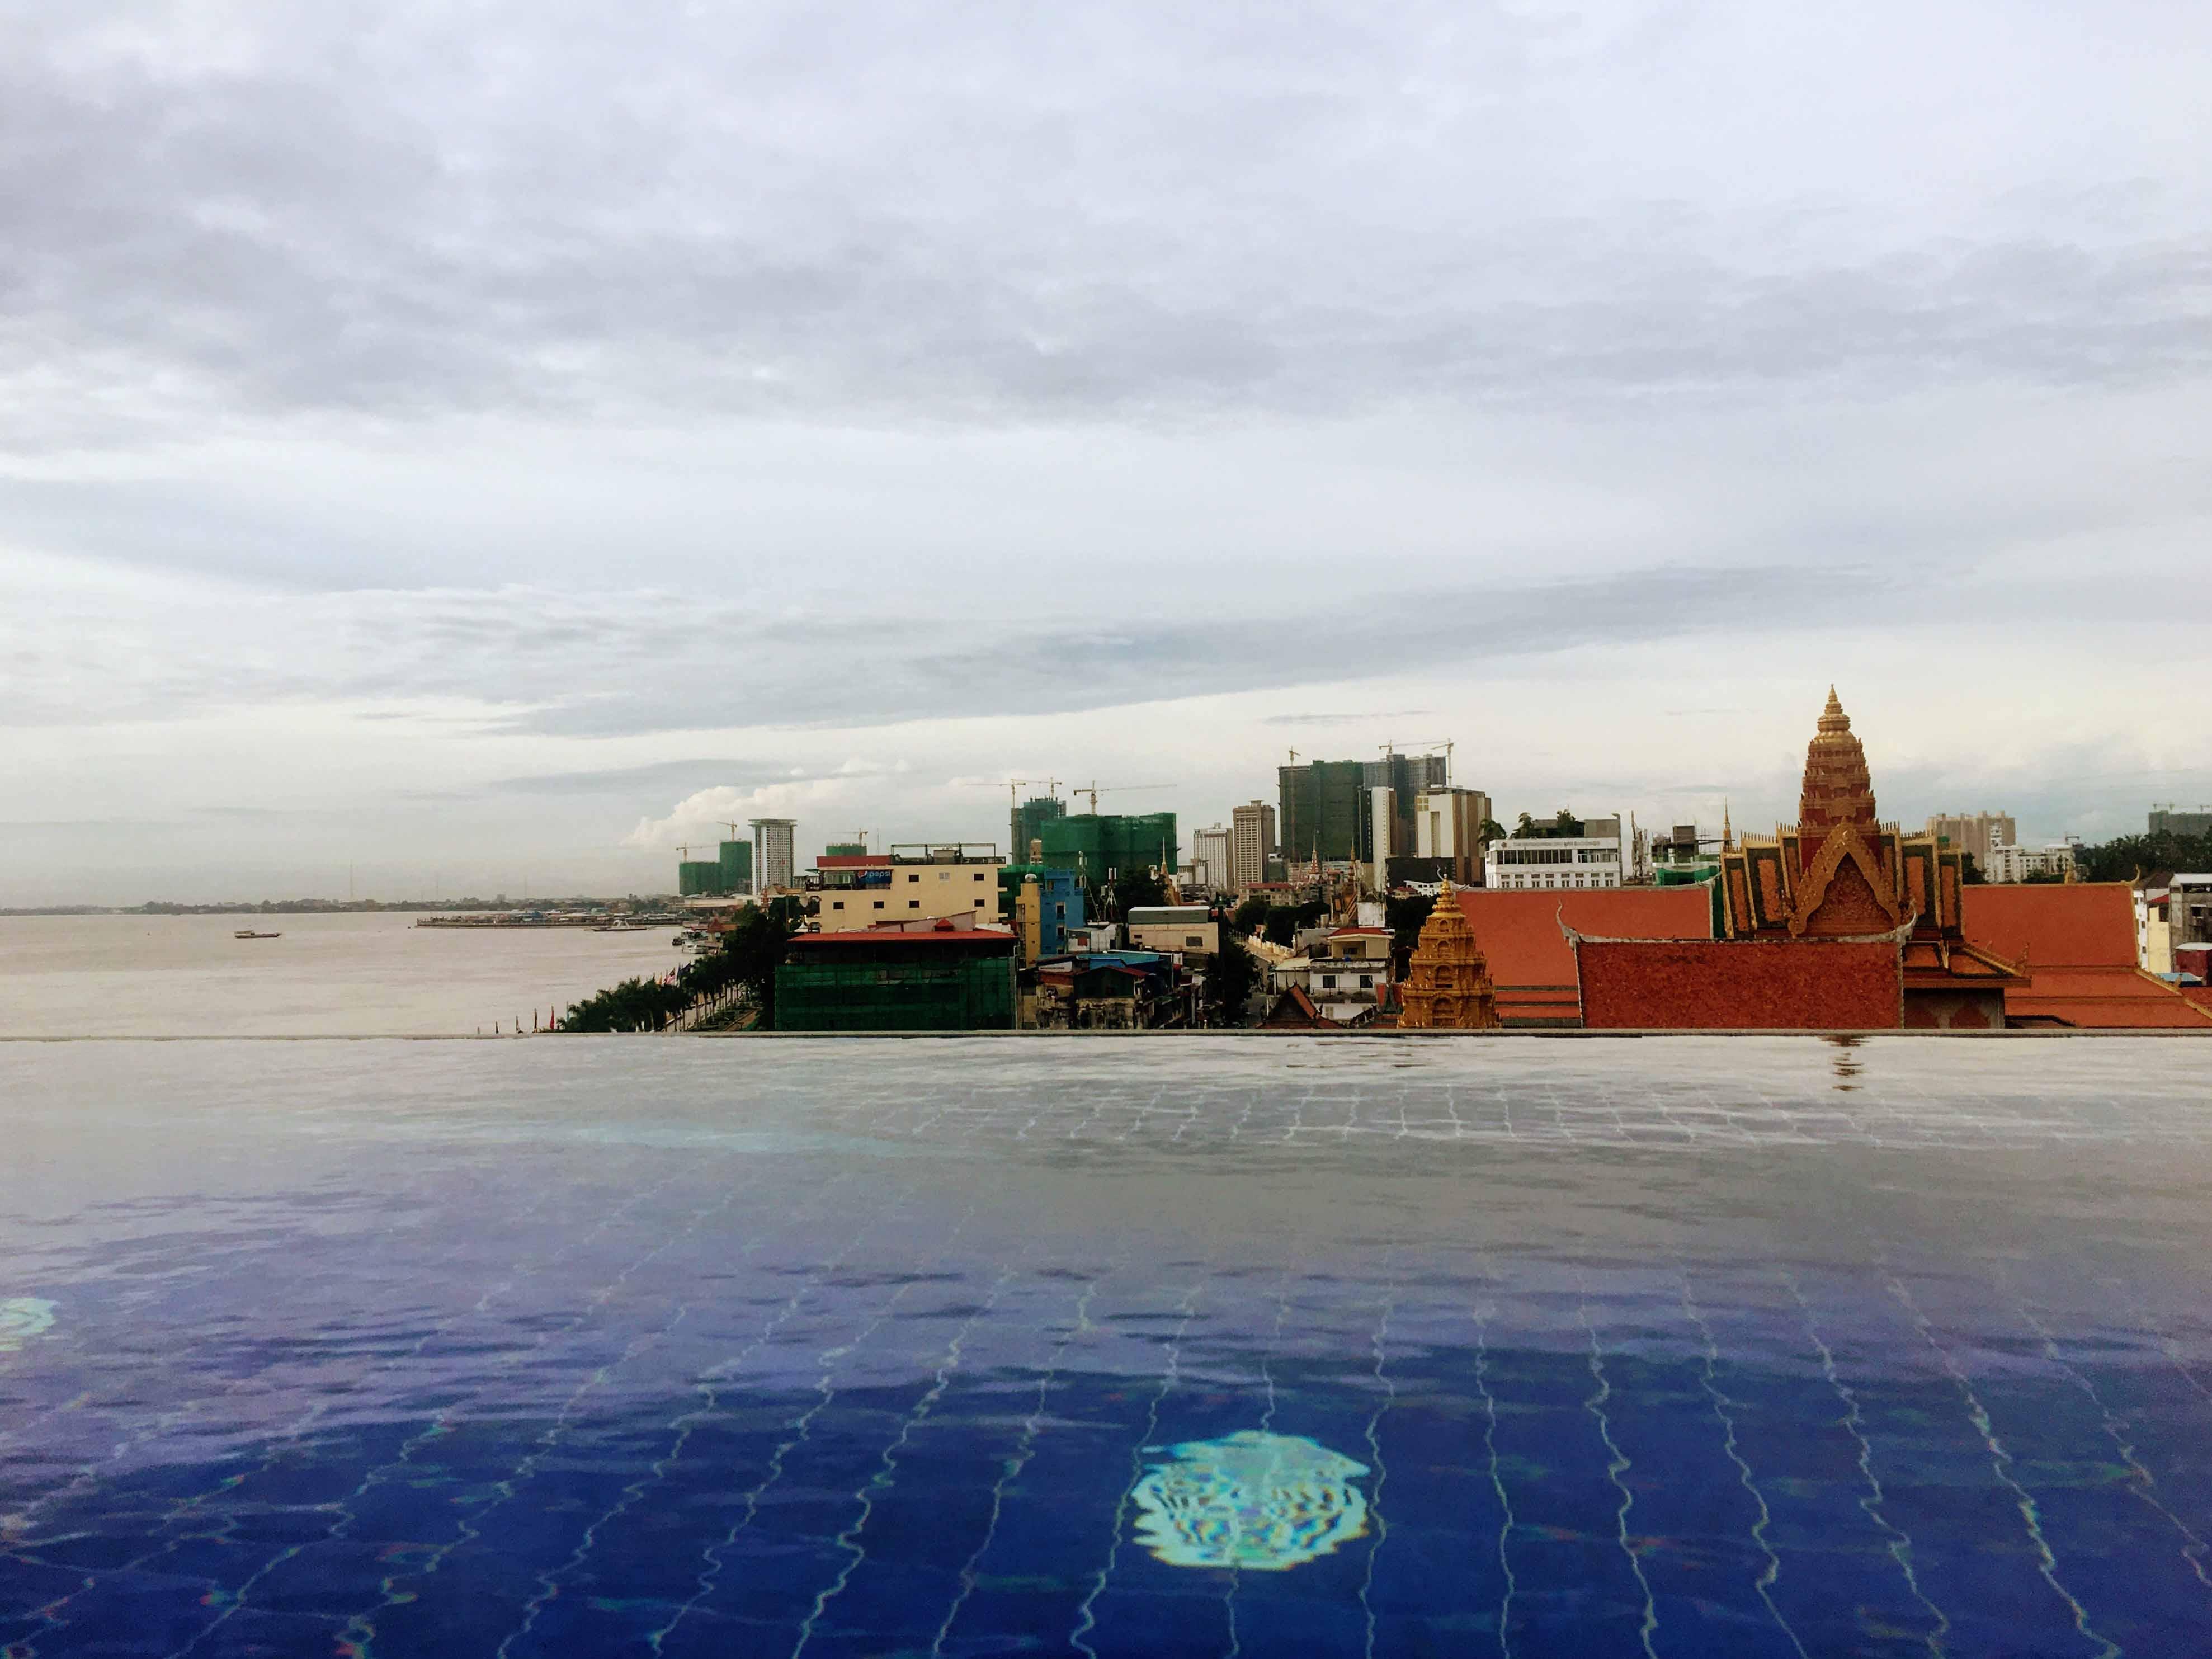 ohana hotel, phnom penh, cambodja, alojamento, swimming pool, piscina